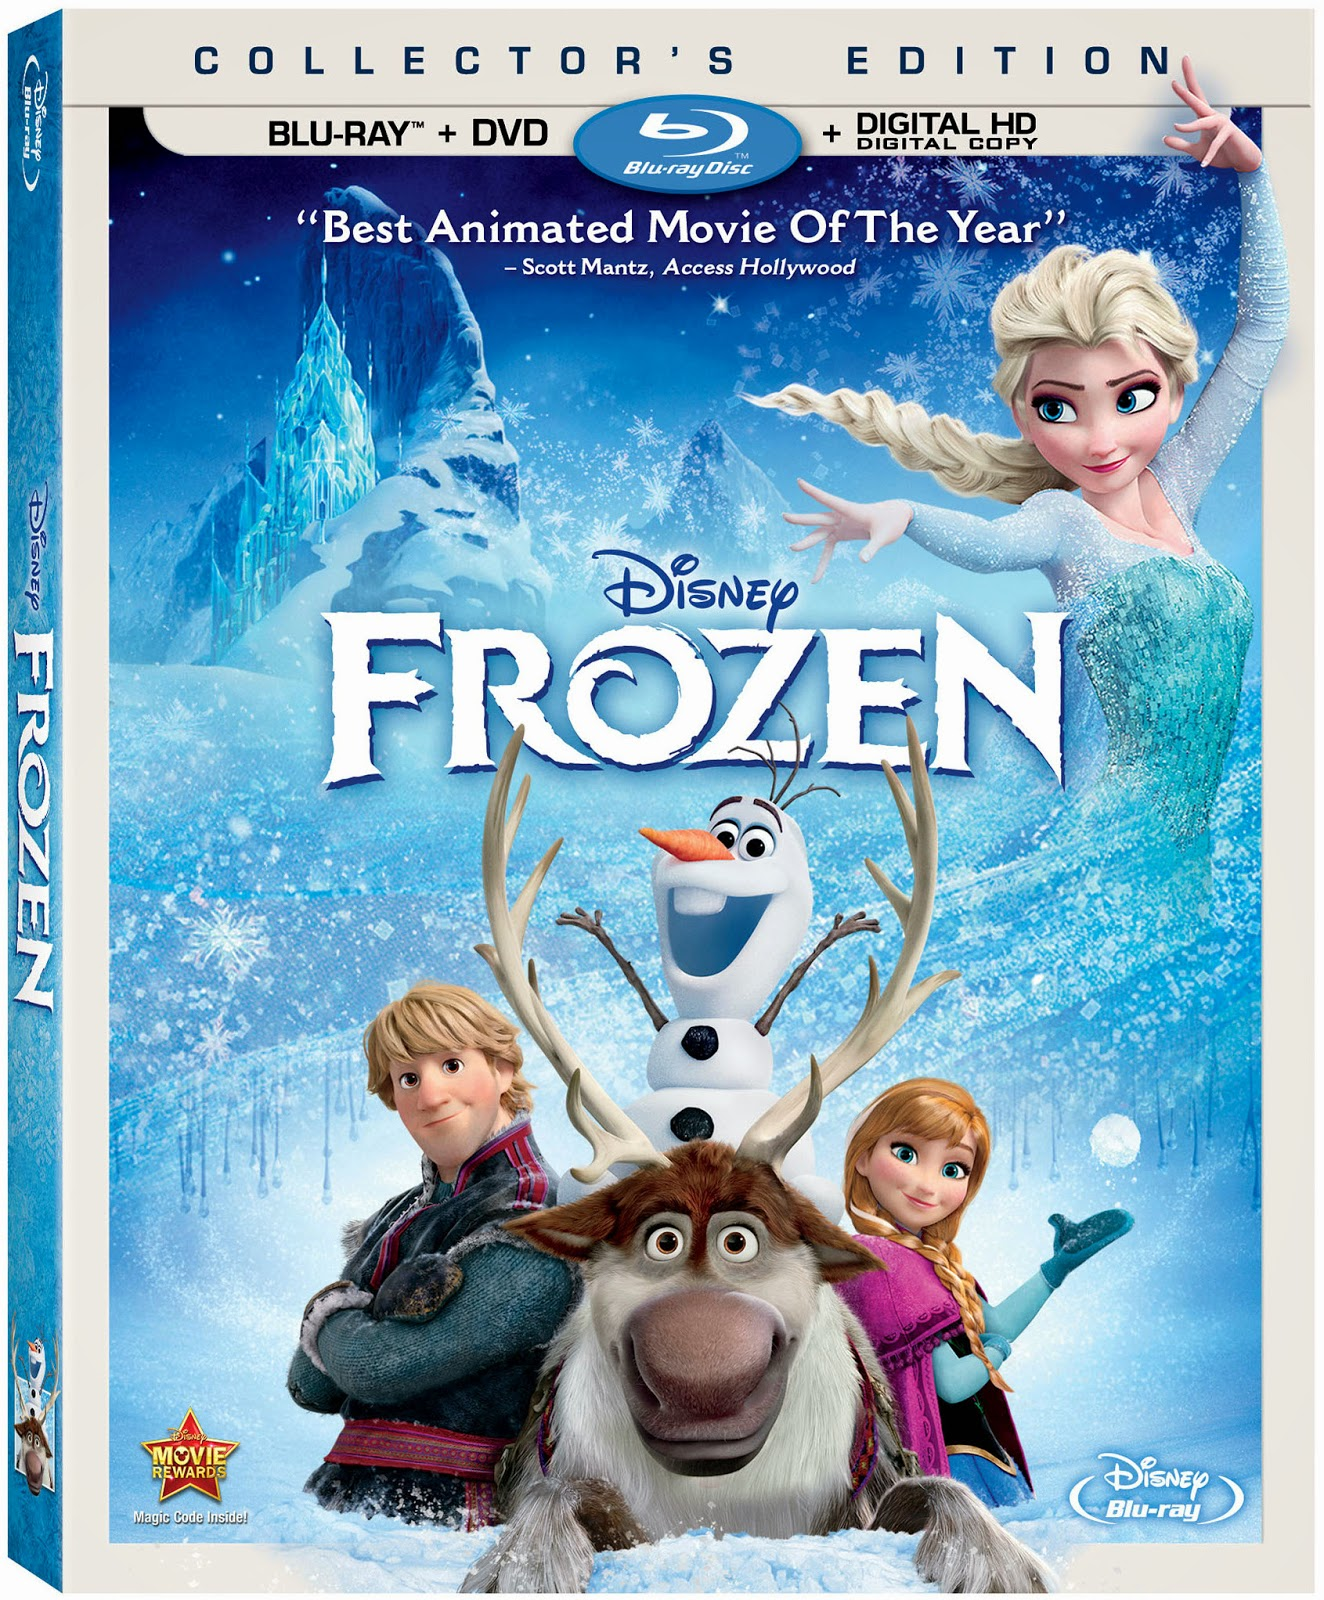 Frozen DVD Giveaway!